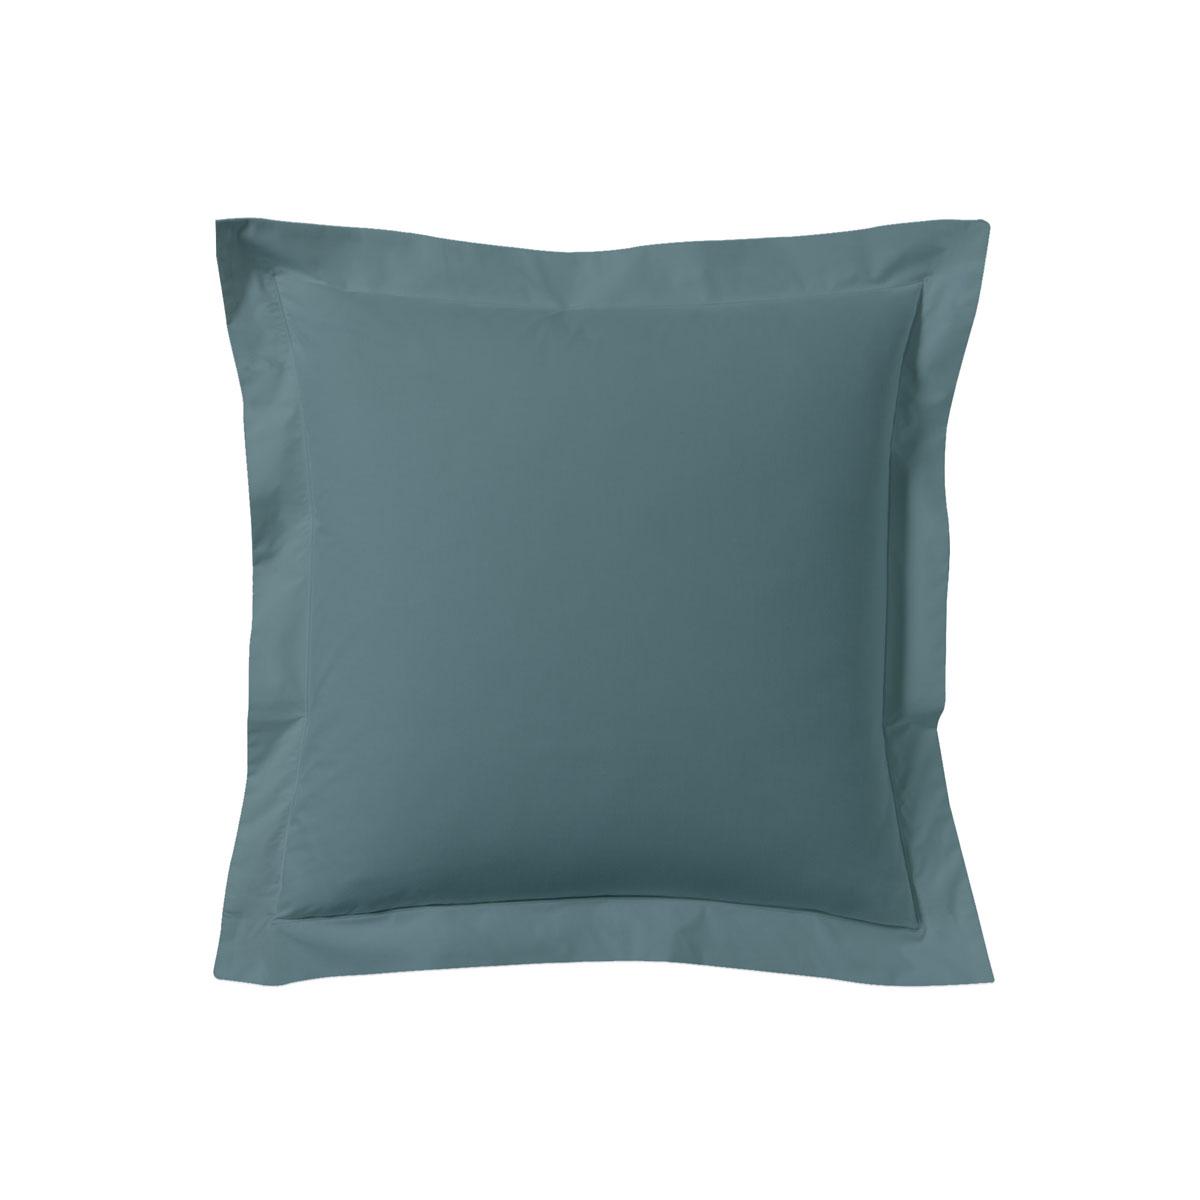 Taie d'oreiller unie en coton, Made in France bleu 63x63